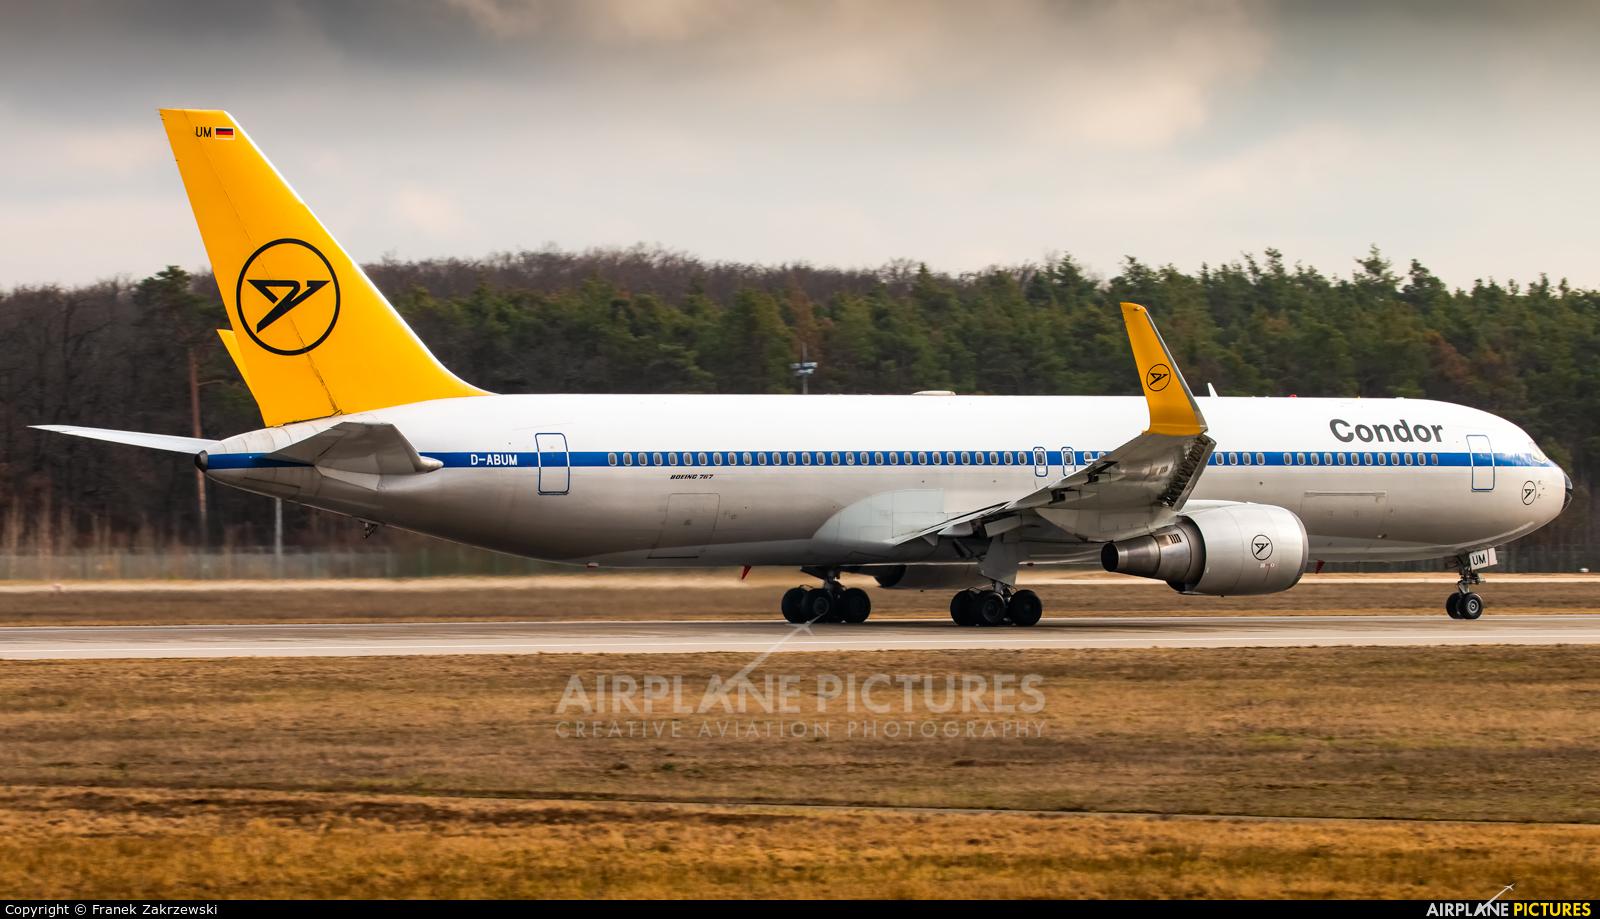 Condor D-ABUM aircraft at Frankfurt